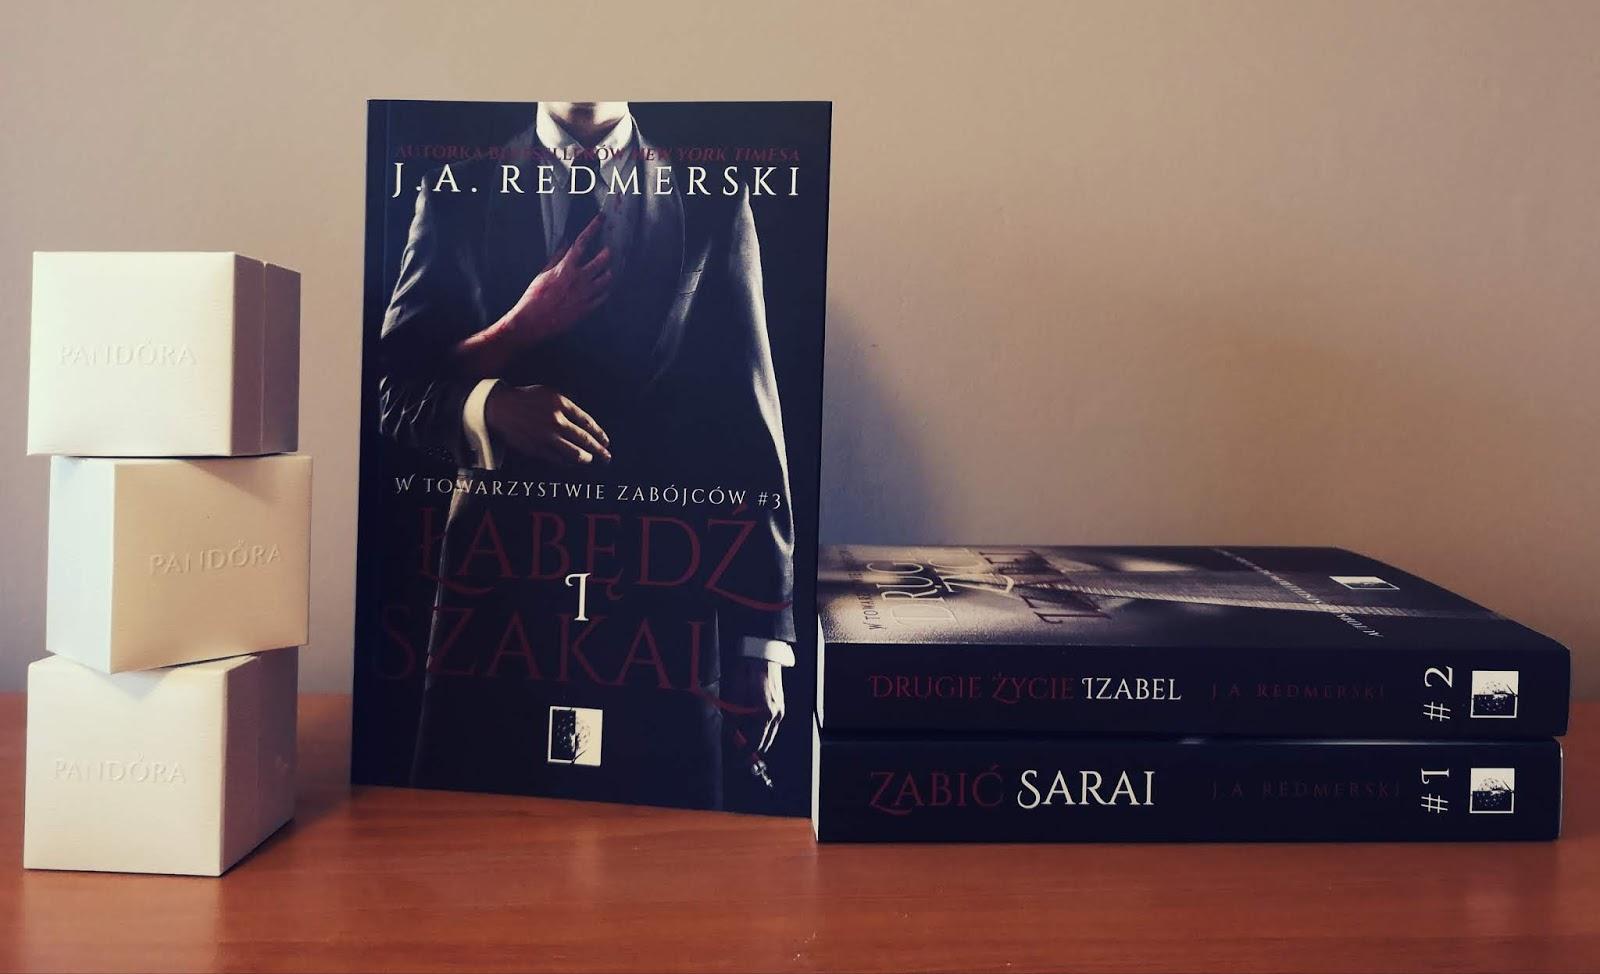 de22f5b5e70e73 Zainfekowana książka: Łabędź i Szakal - J.A. Redmerski